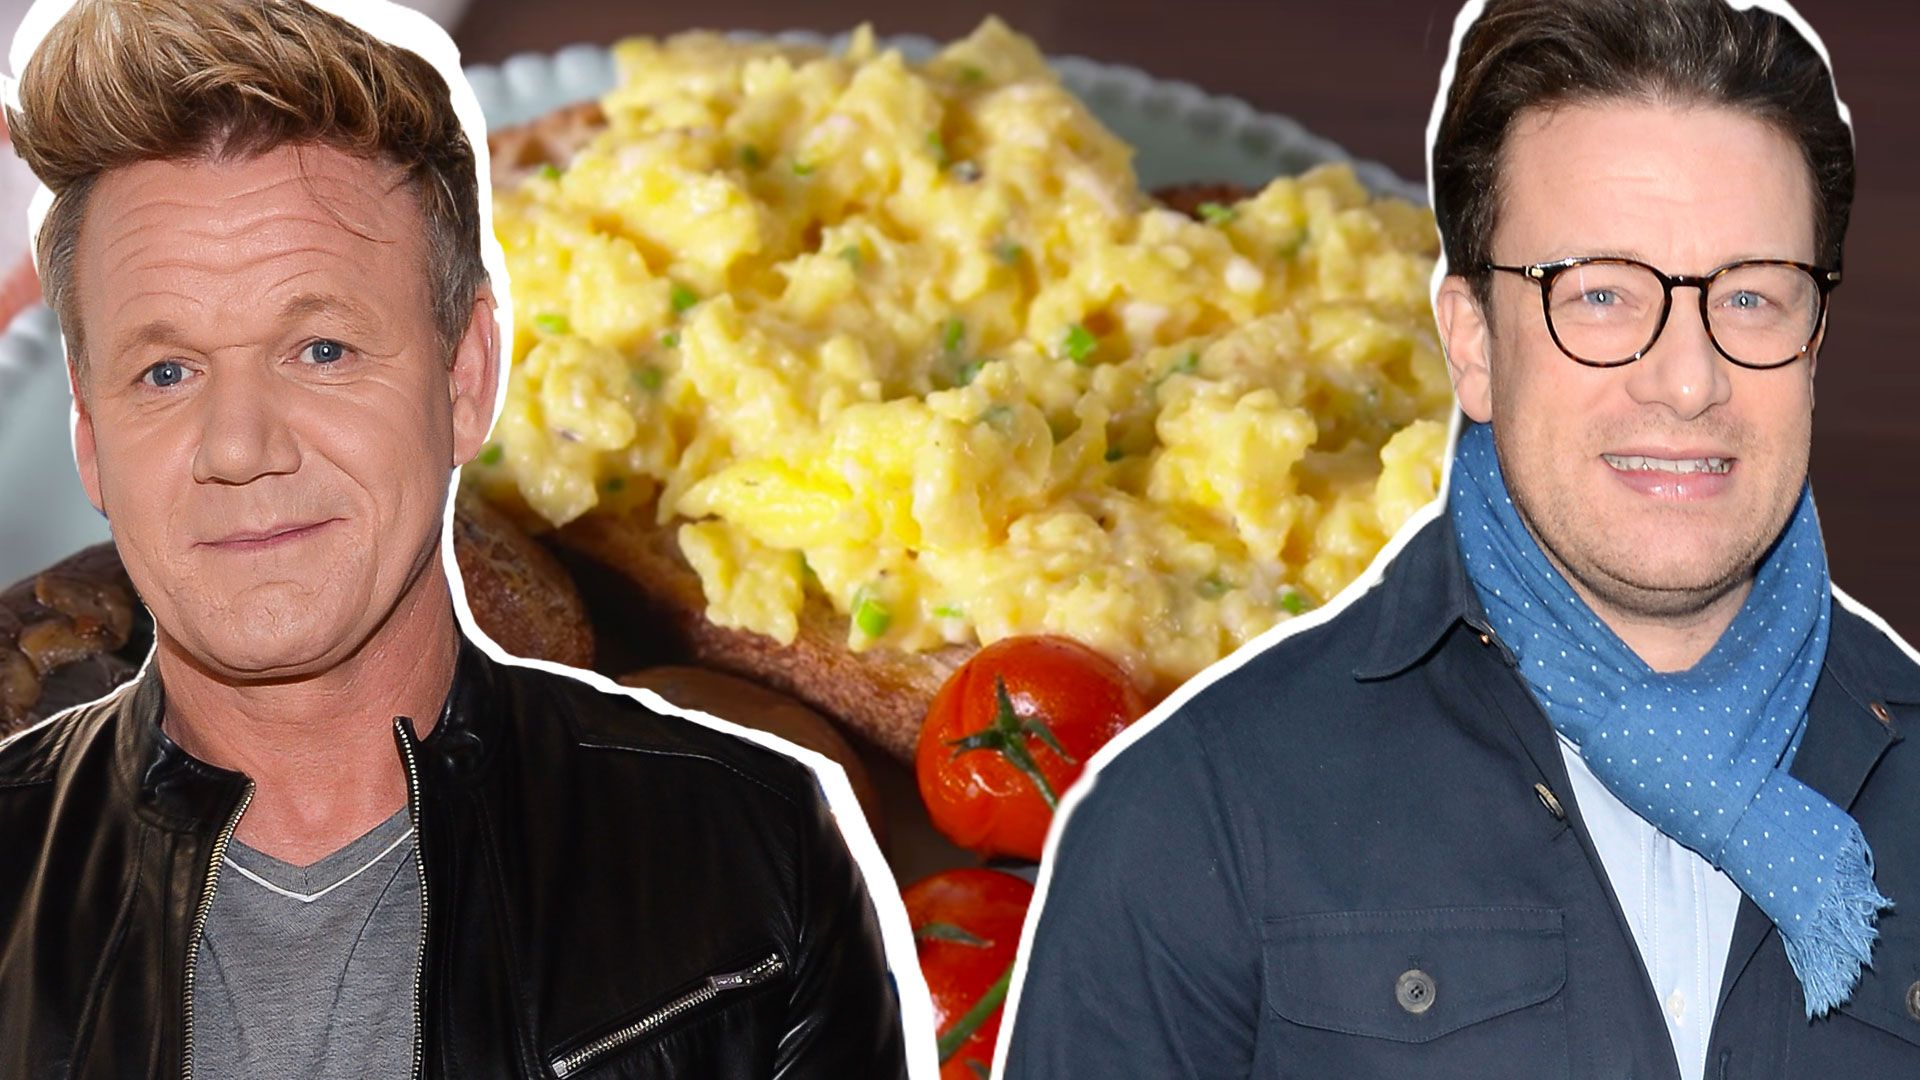 Gordon Ramsay Vs Jamie Oliver Whose Scrambled Eggs Are Better